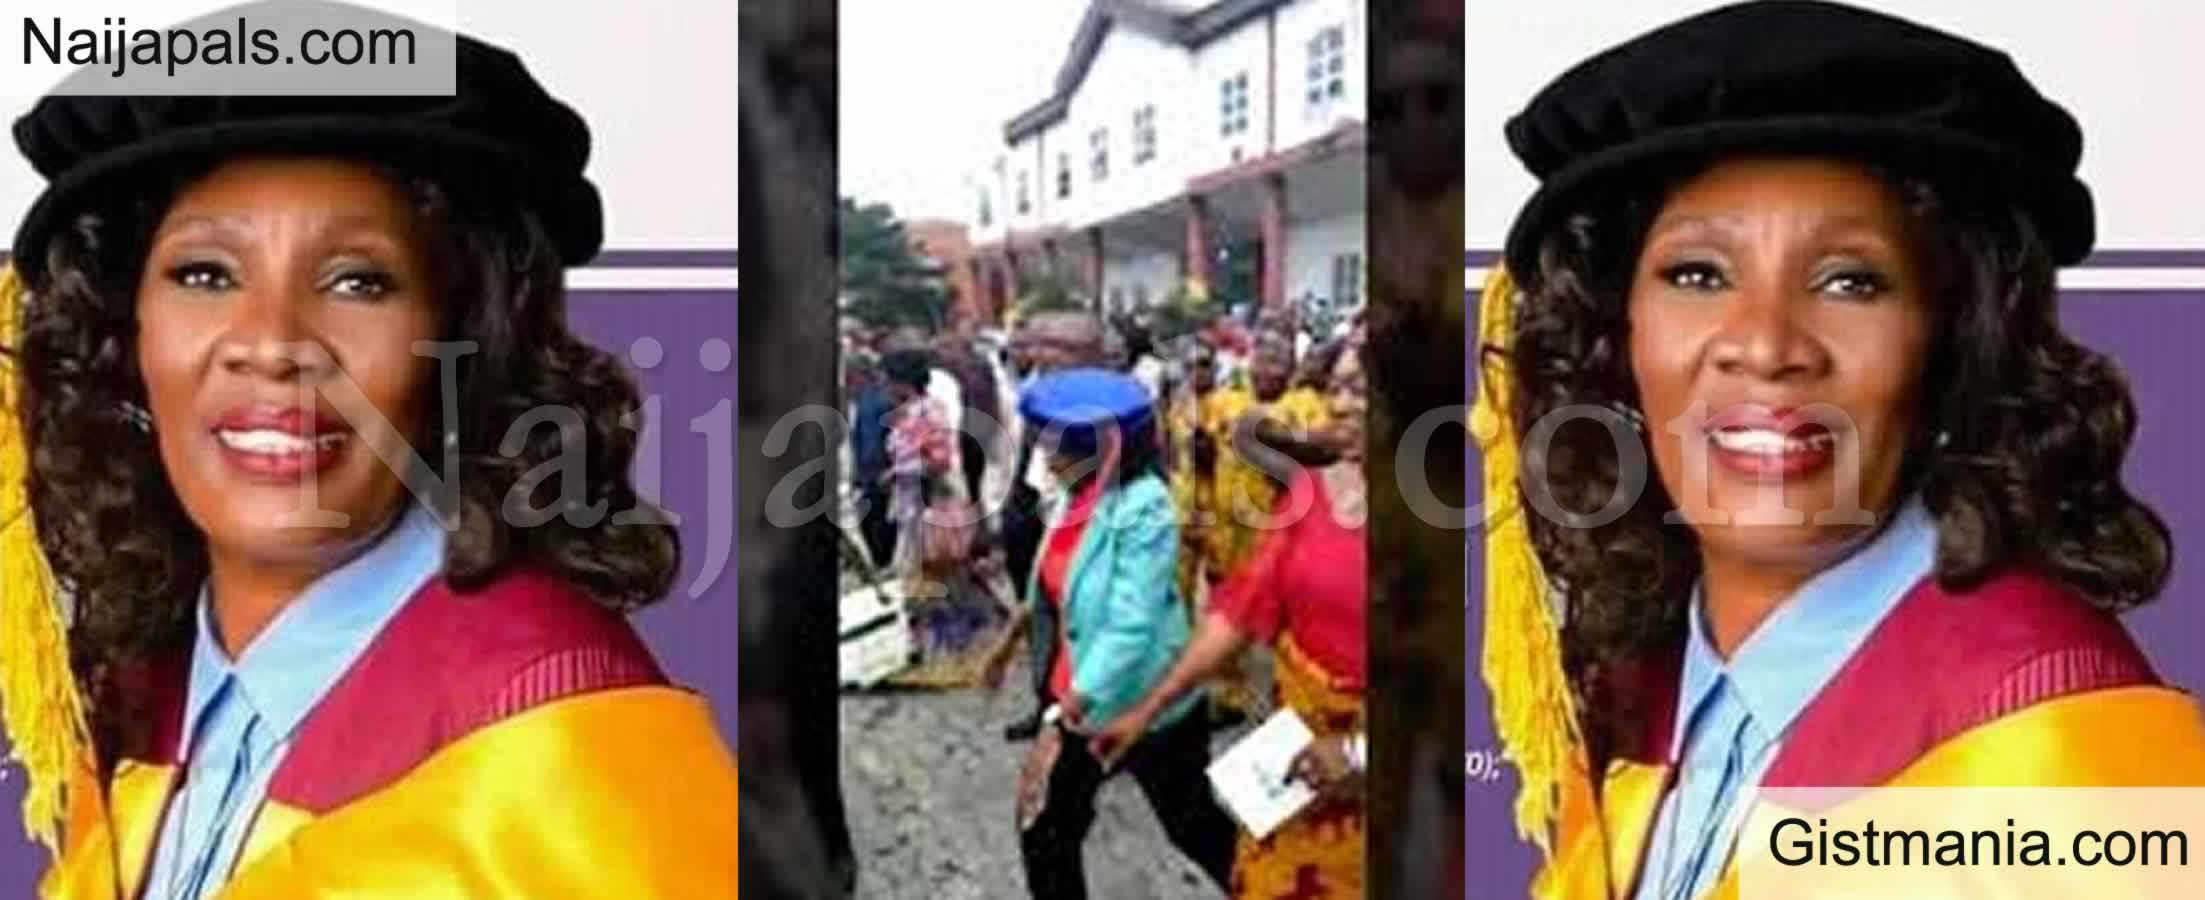 <img alt='.' class='lazyload' data-src='https://img.gistmania.com/emot/video.gif' /> <b>Meet Prof. Nnenna Nnannaya Oti, The First Female VC of FUTO</b>